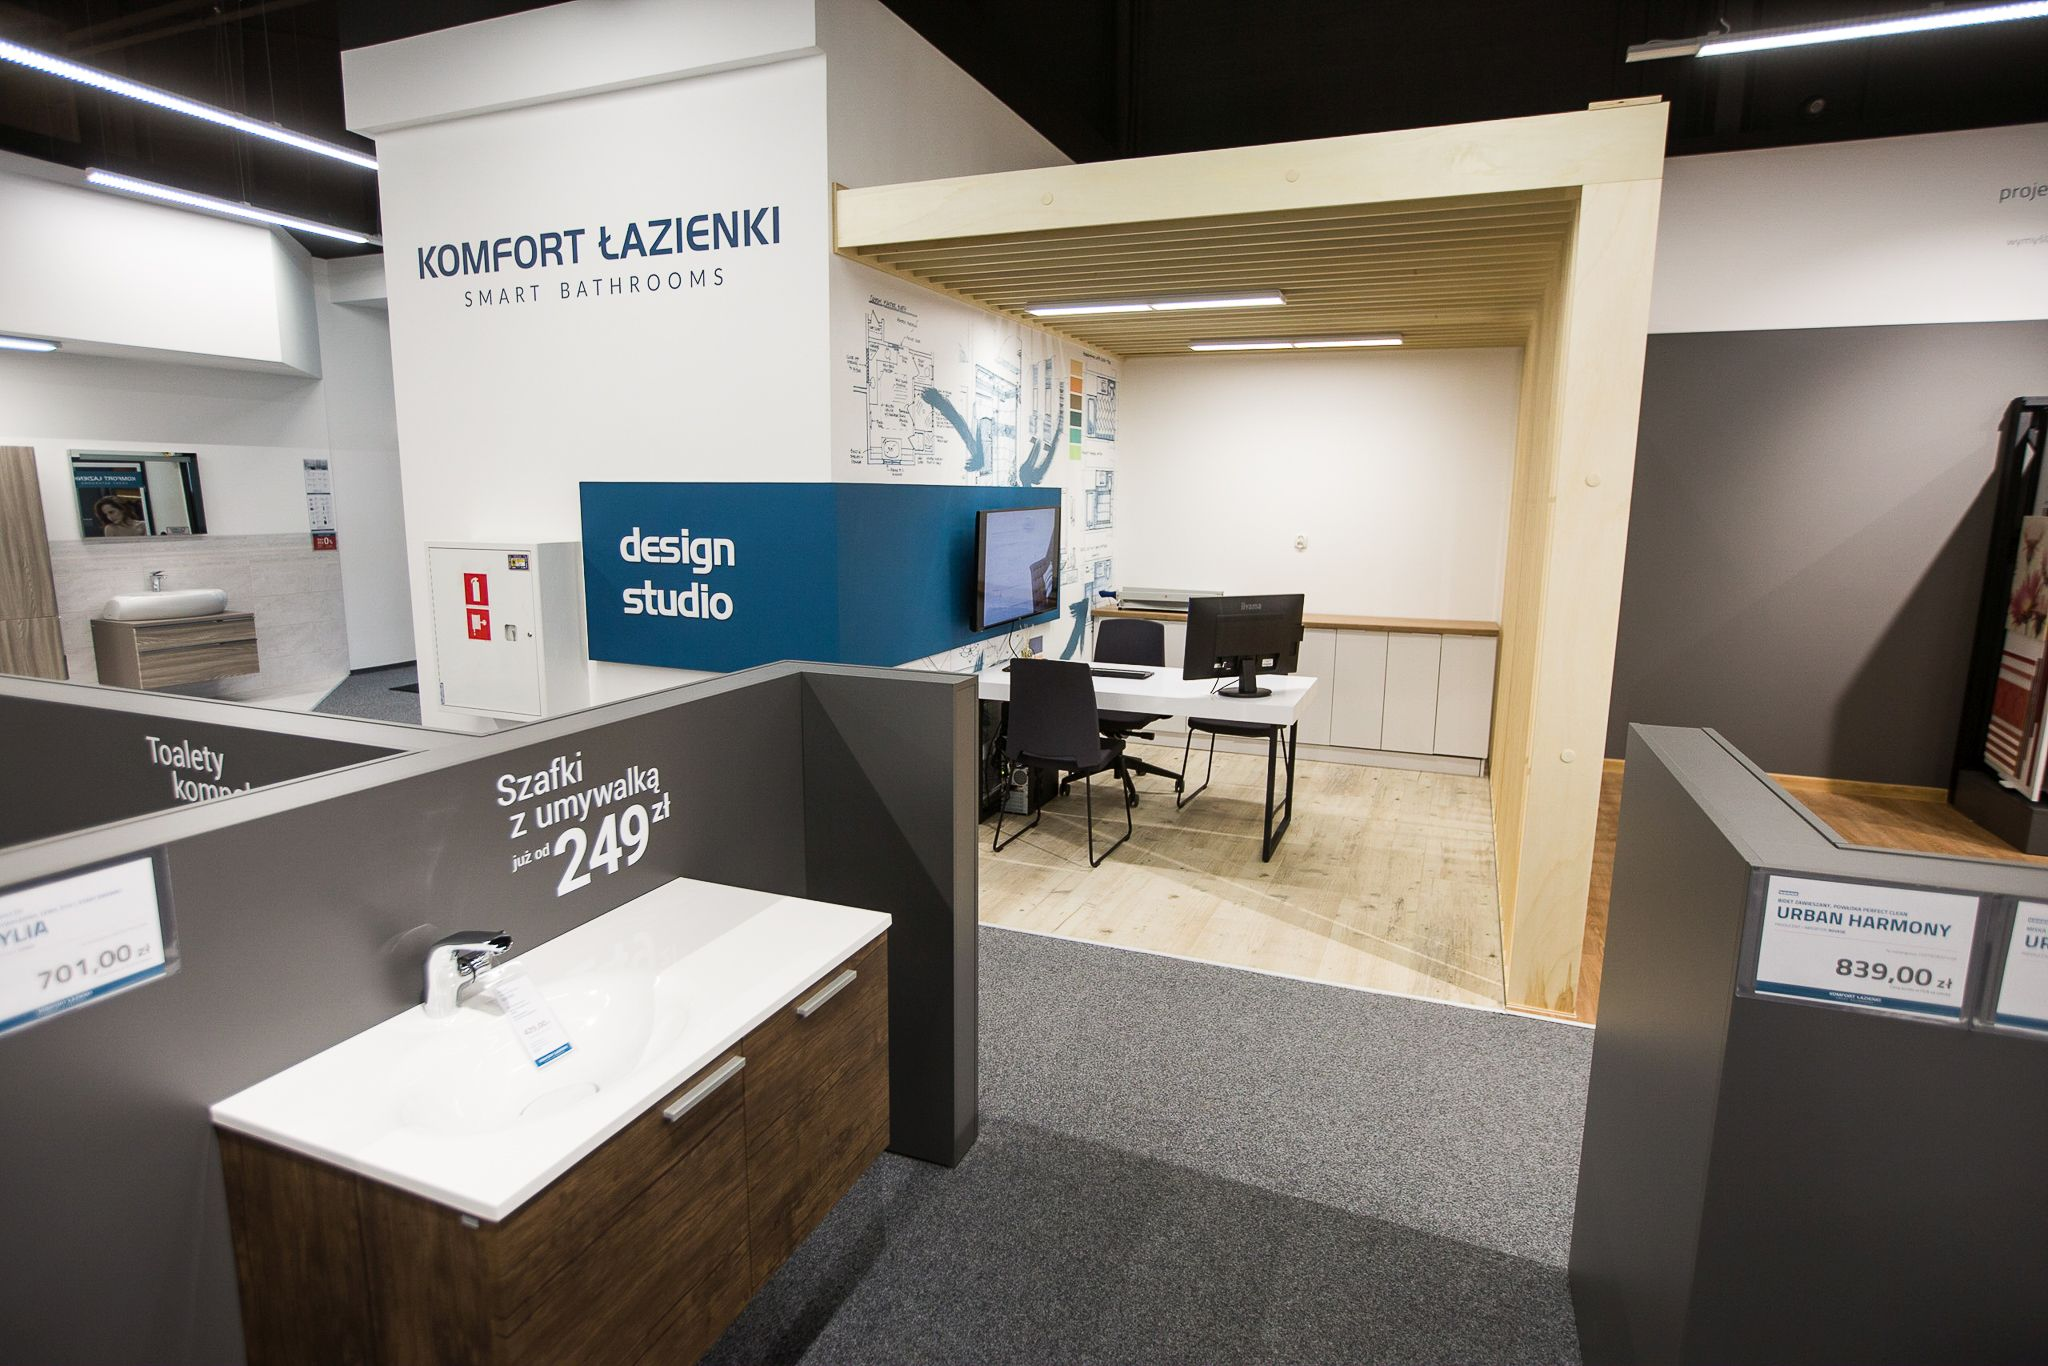 Debiut Komfort łazienki W Warszawie